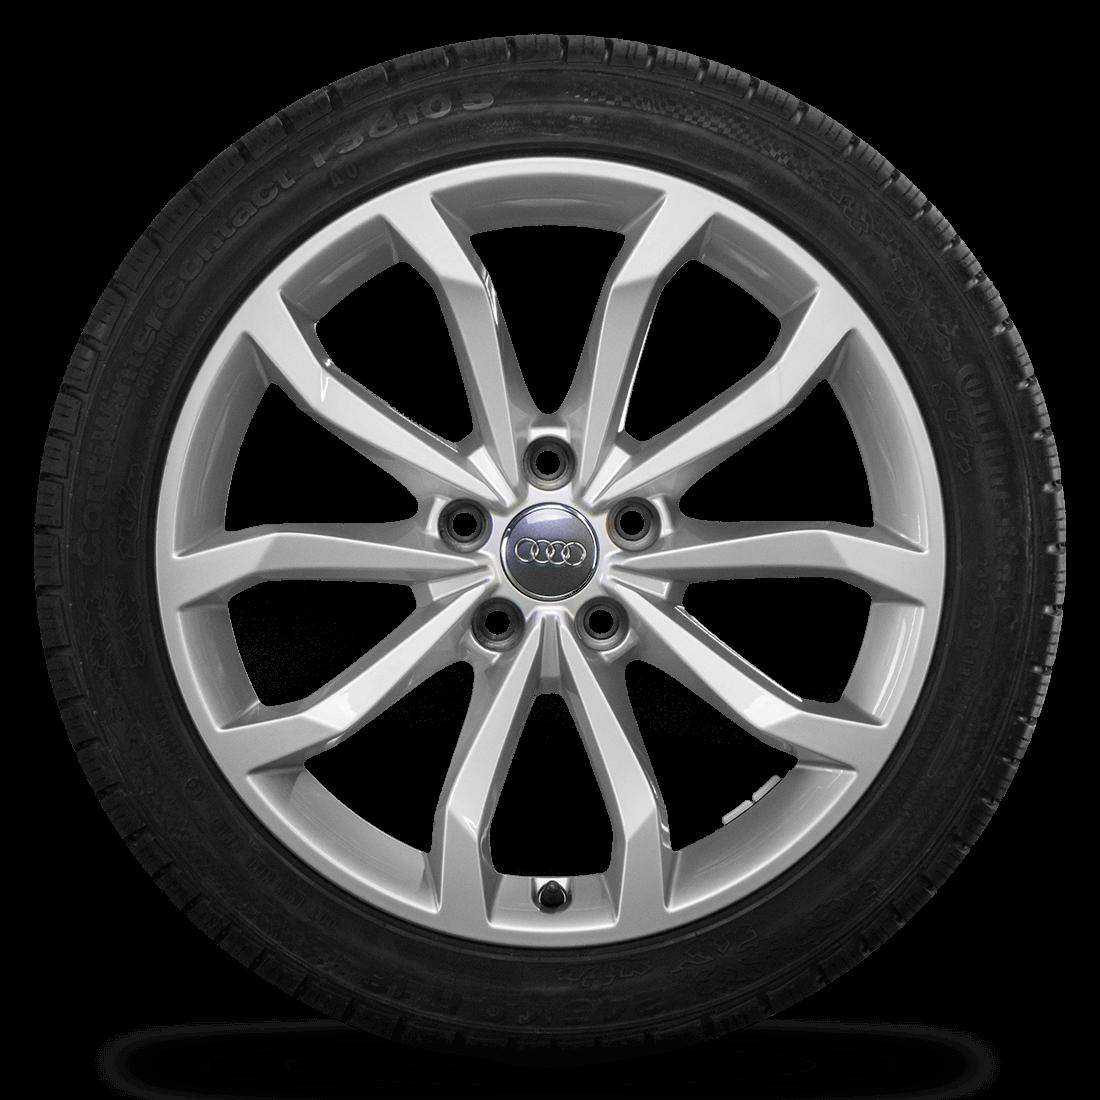 Audi 18 Zoll Winterräder Alufelgen A4 S4 8W B9 Felgen Conti Winterreifen 8 mm